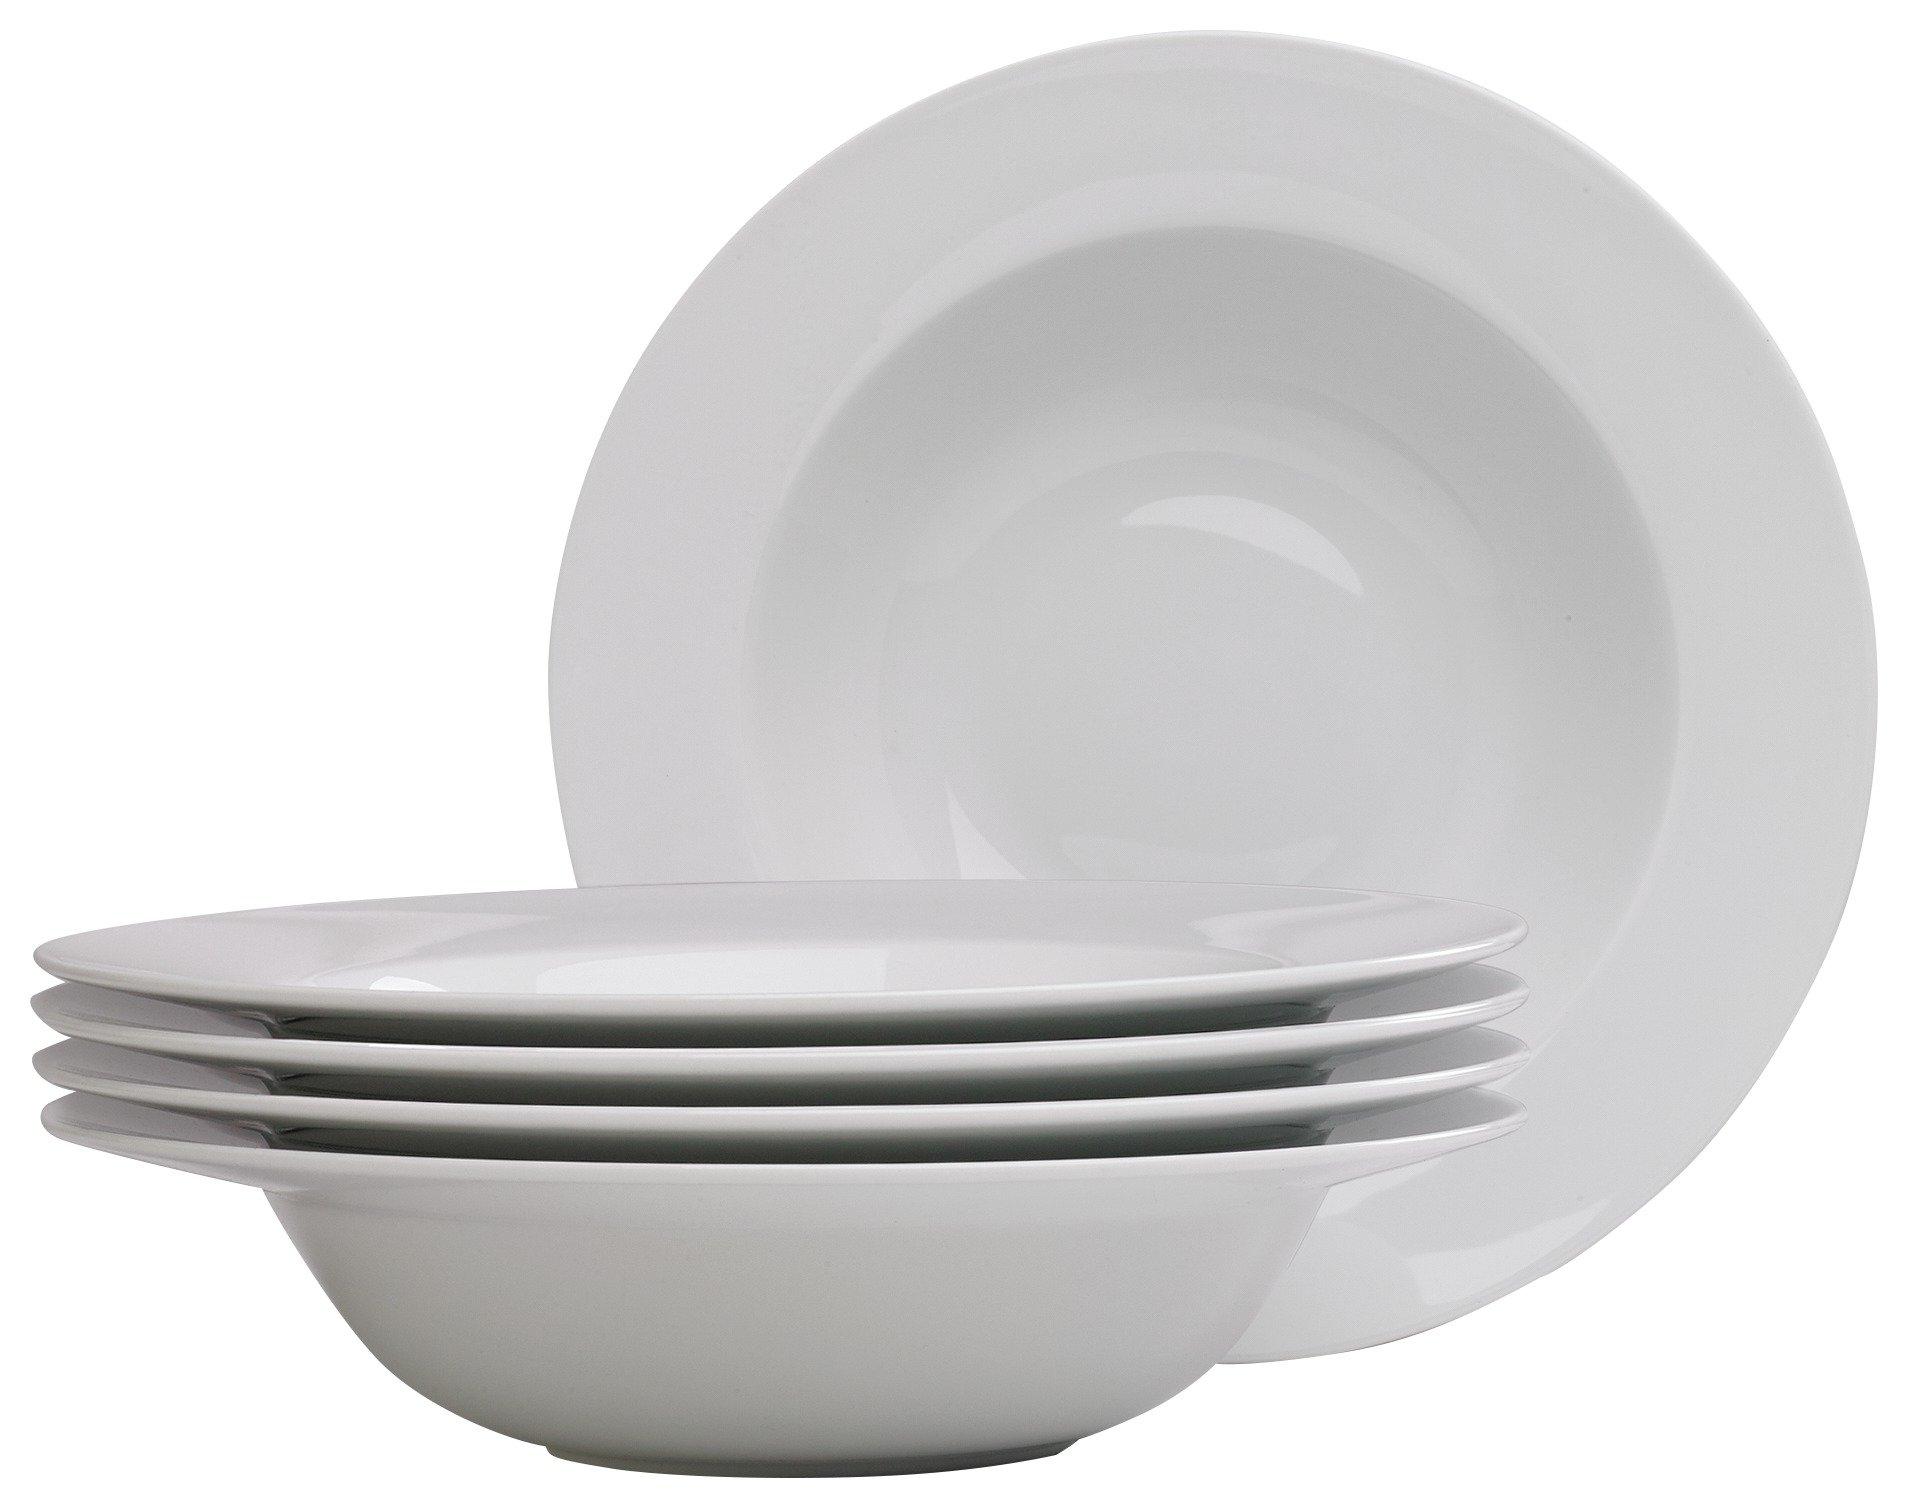 Argos Home Set of 4 Large Pasta Bowls - White